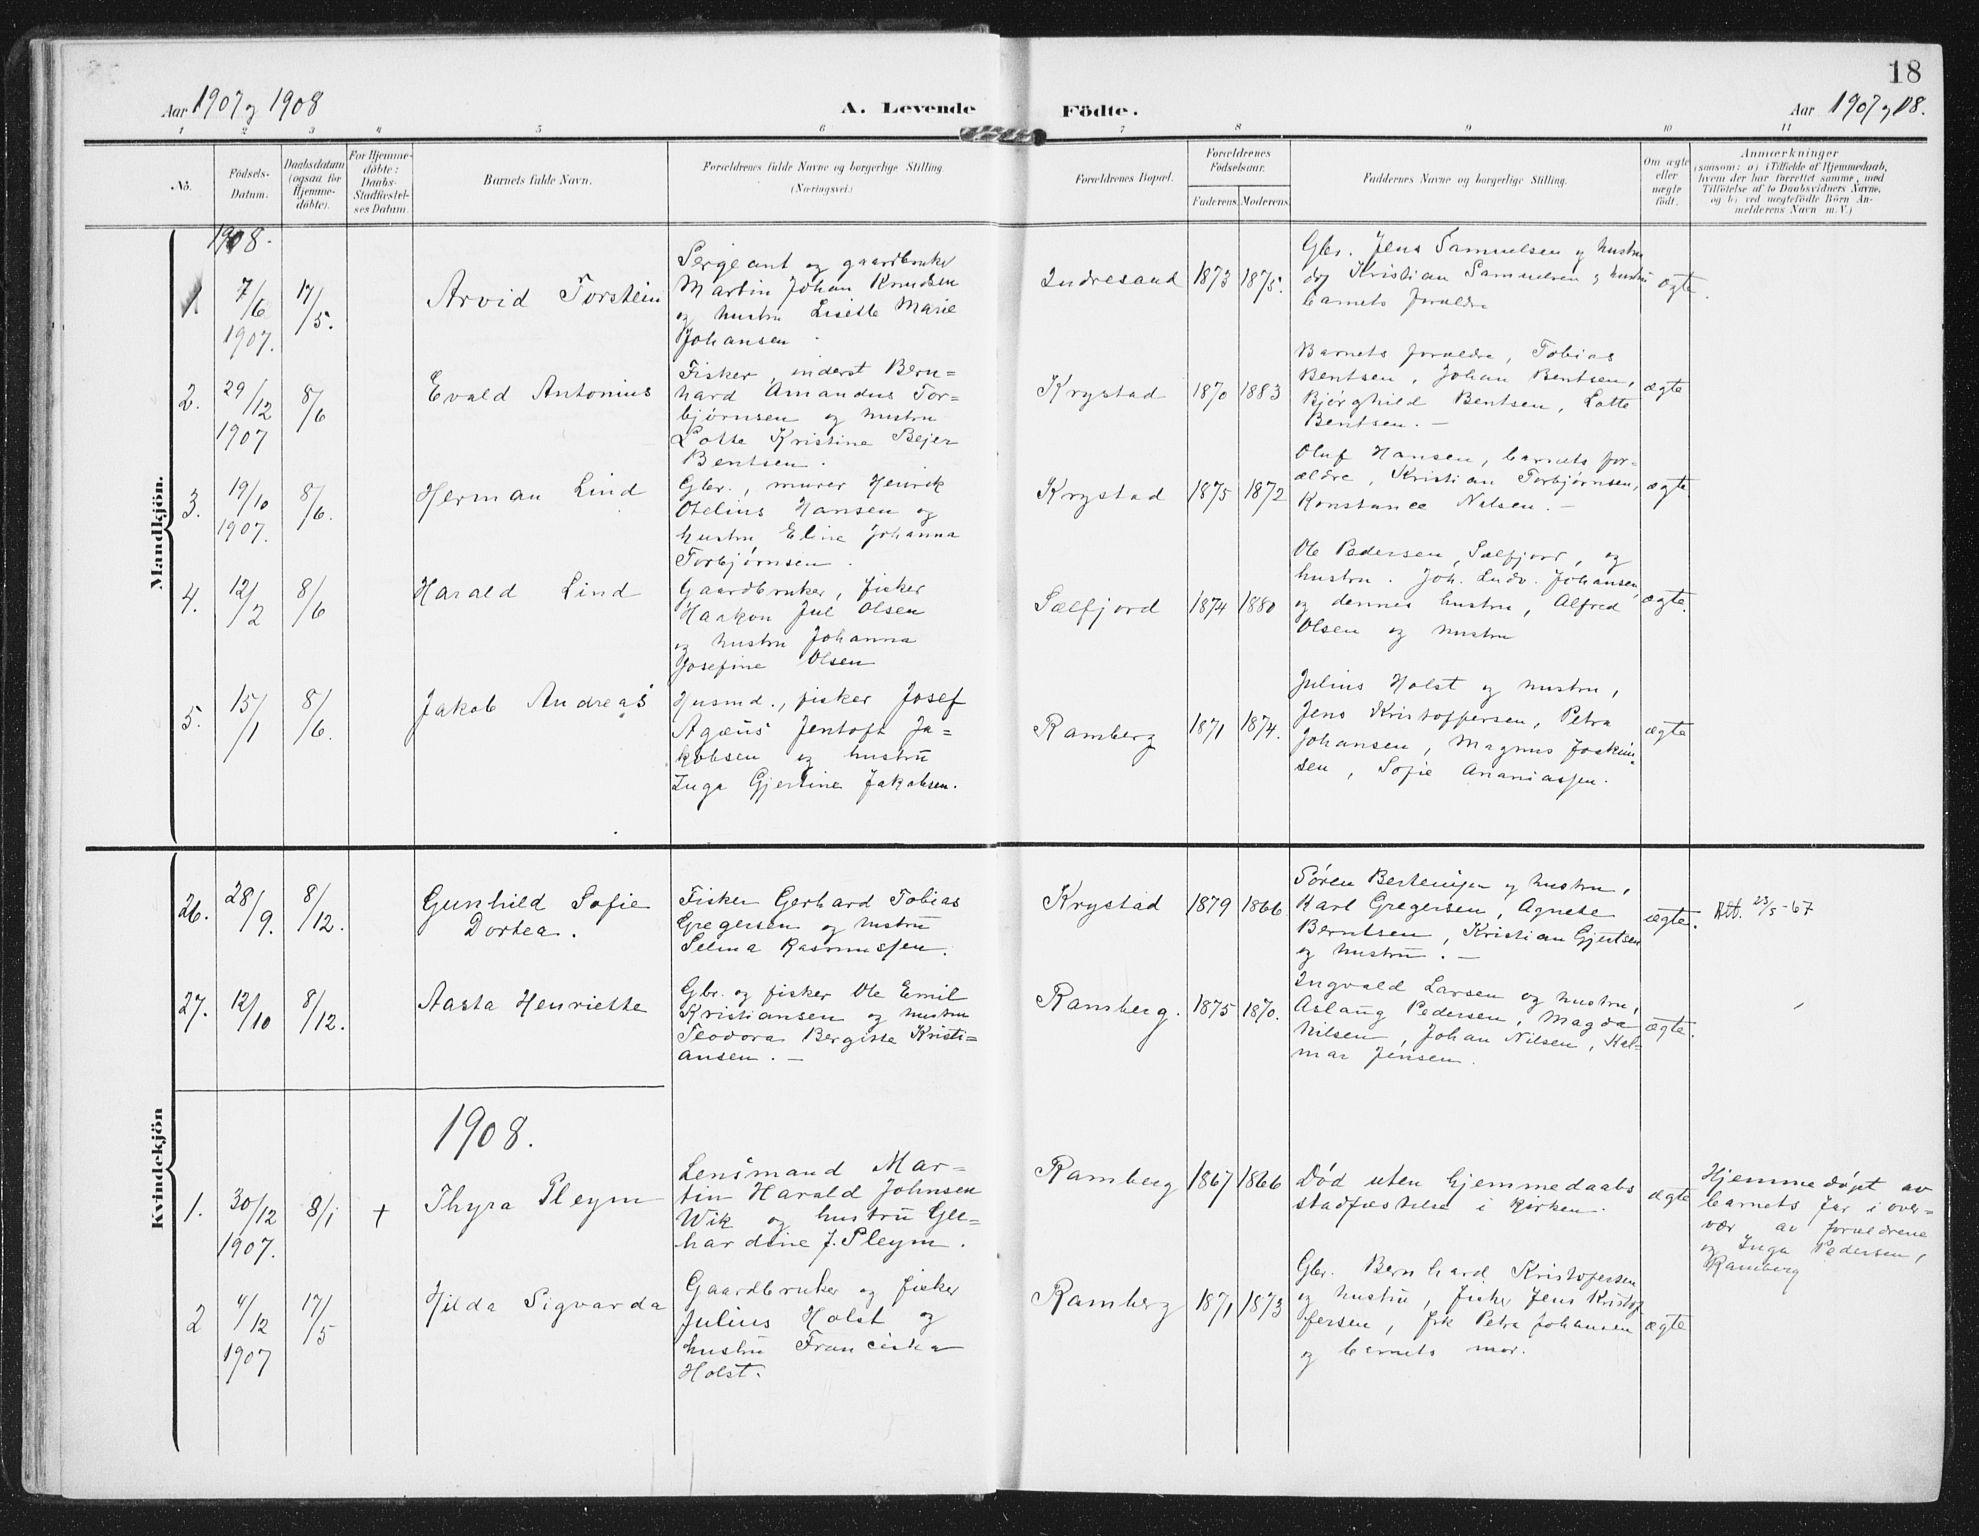 SAT, Ministerialprotokoller, klokkerbøker og fødselsregistre - Nordland, 885/L1206: Ministerialbok nr. 885A07, 1905-1915, s. 18